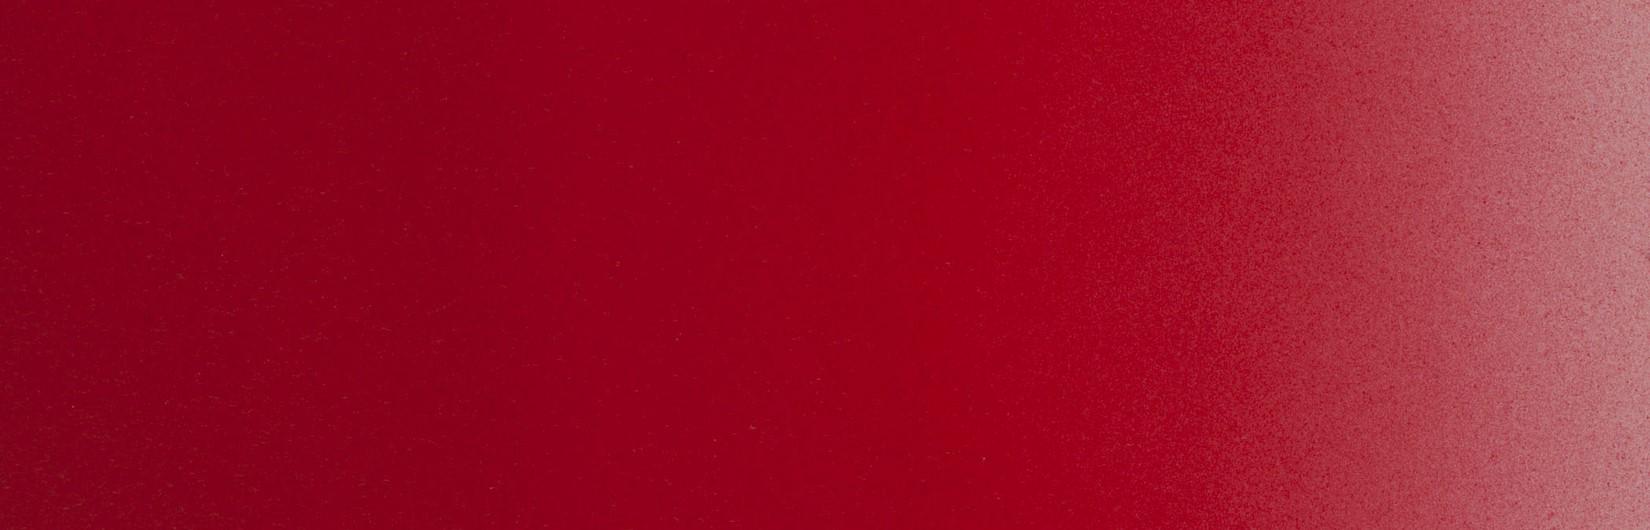 5039-createx-illustration-bloodline-blood-red.jpg